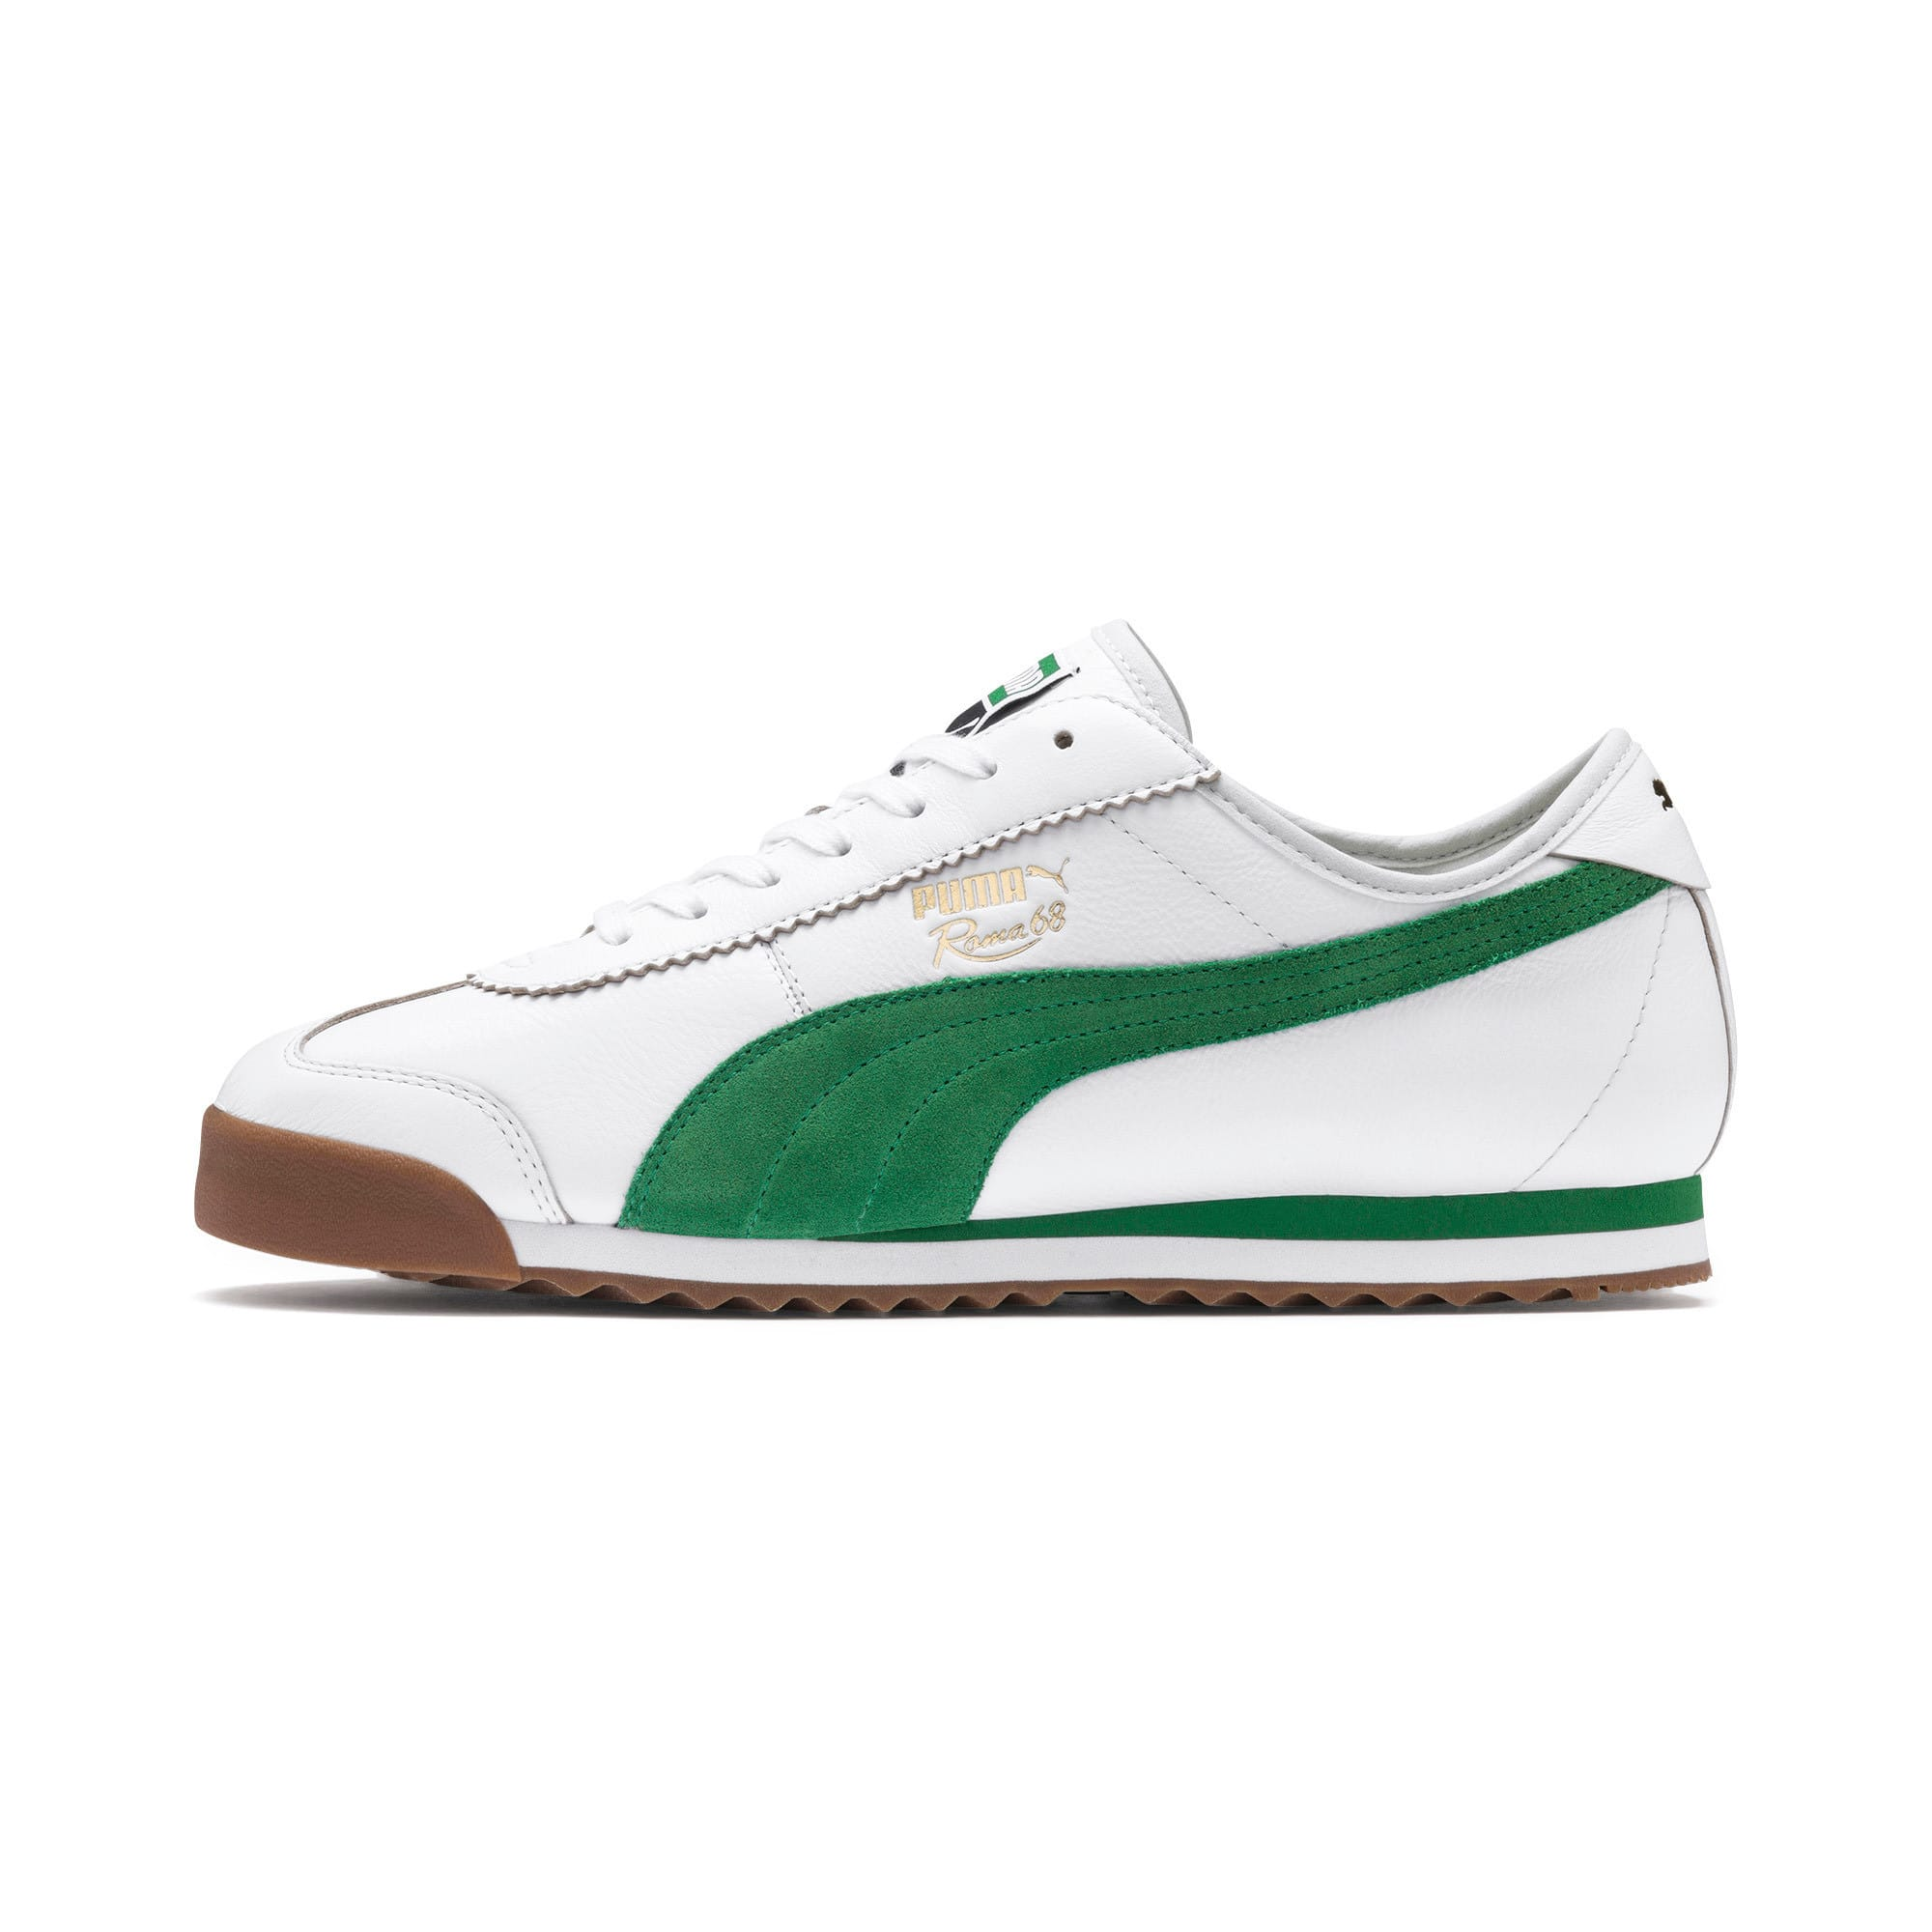 Thumbnail 1 of Roma '68 OG Sneakers, Puma White-Amazon Green, medium